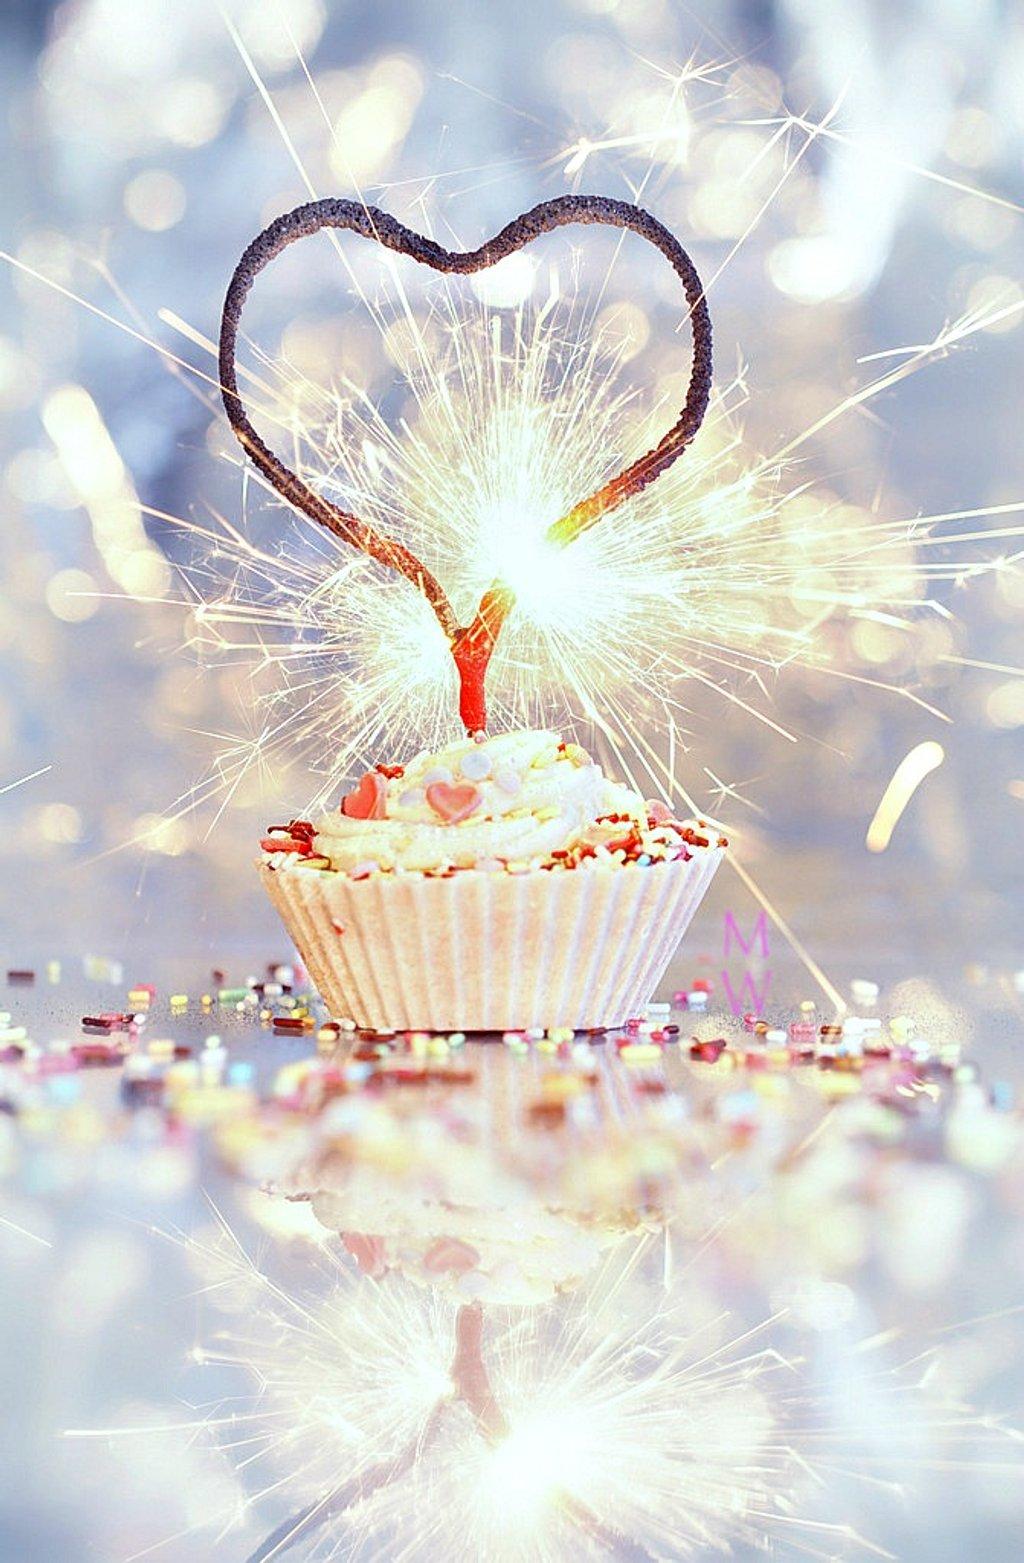 2016-07-04 happy birthday hubby M. by mona65